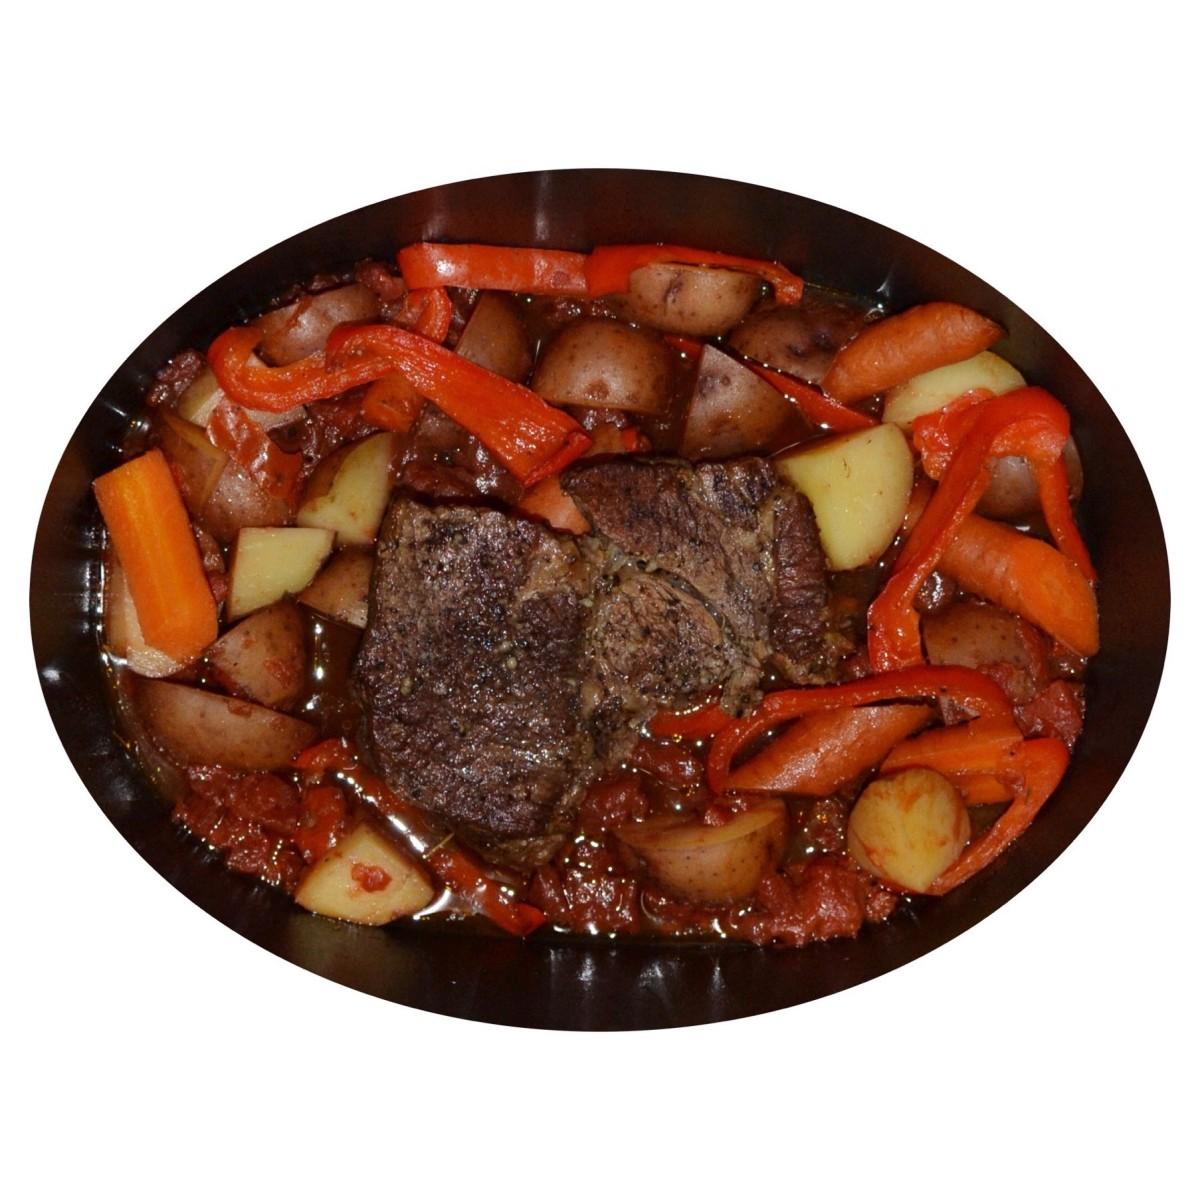 Beef Pot Roast withVegetables